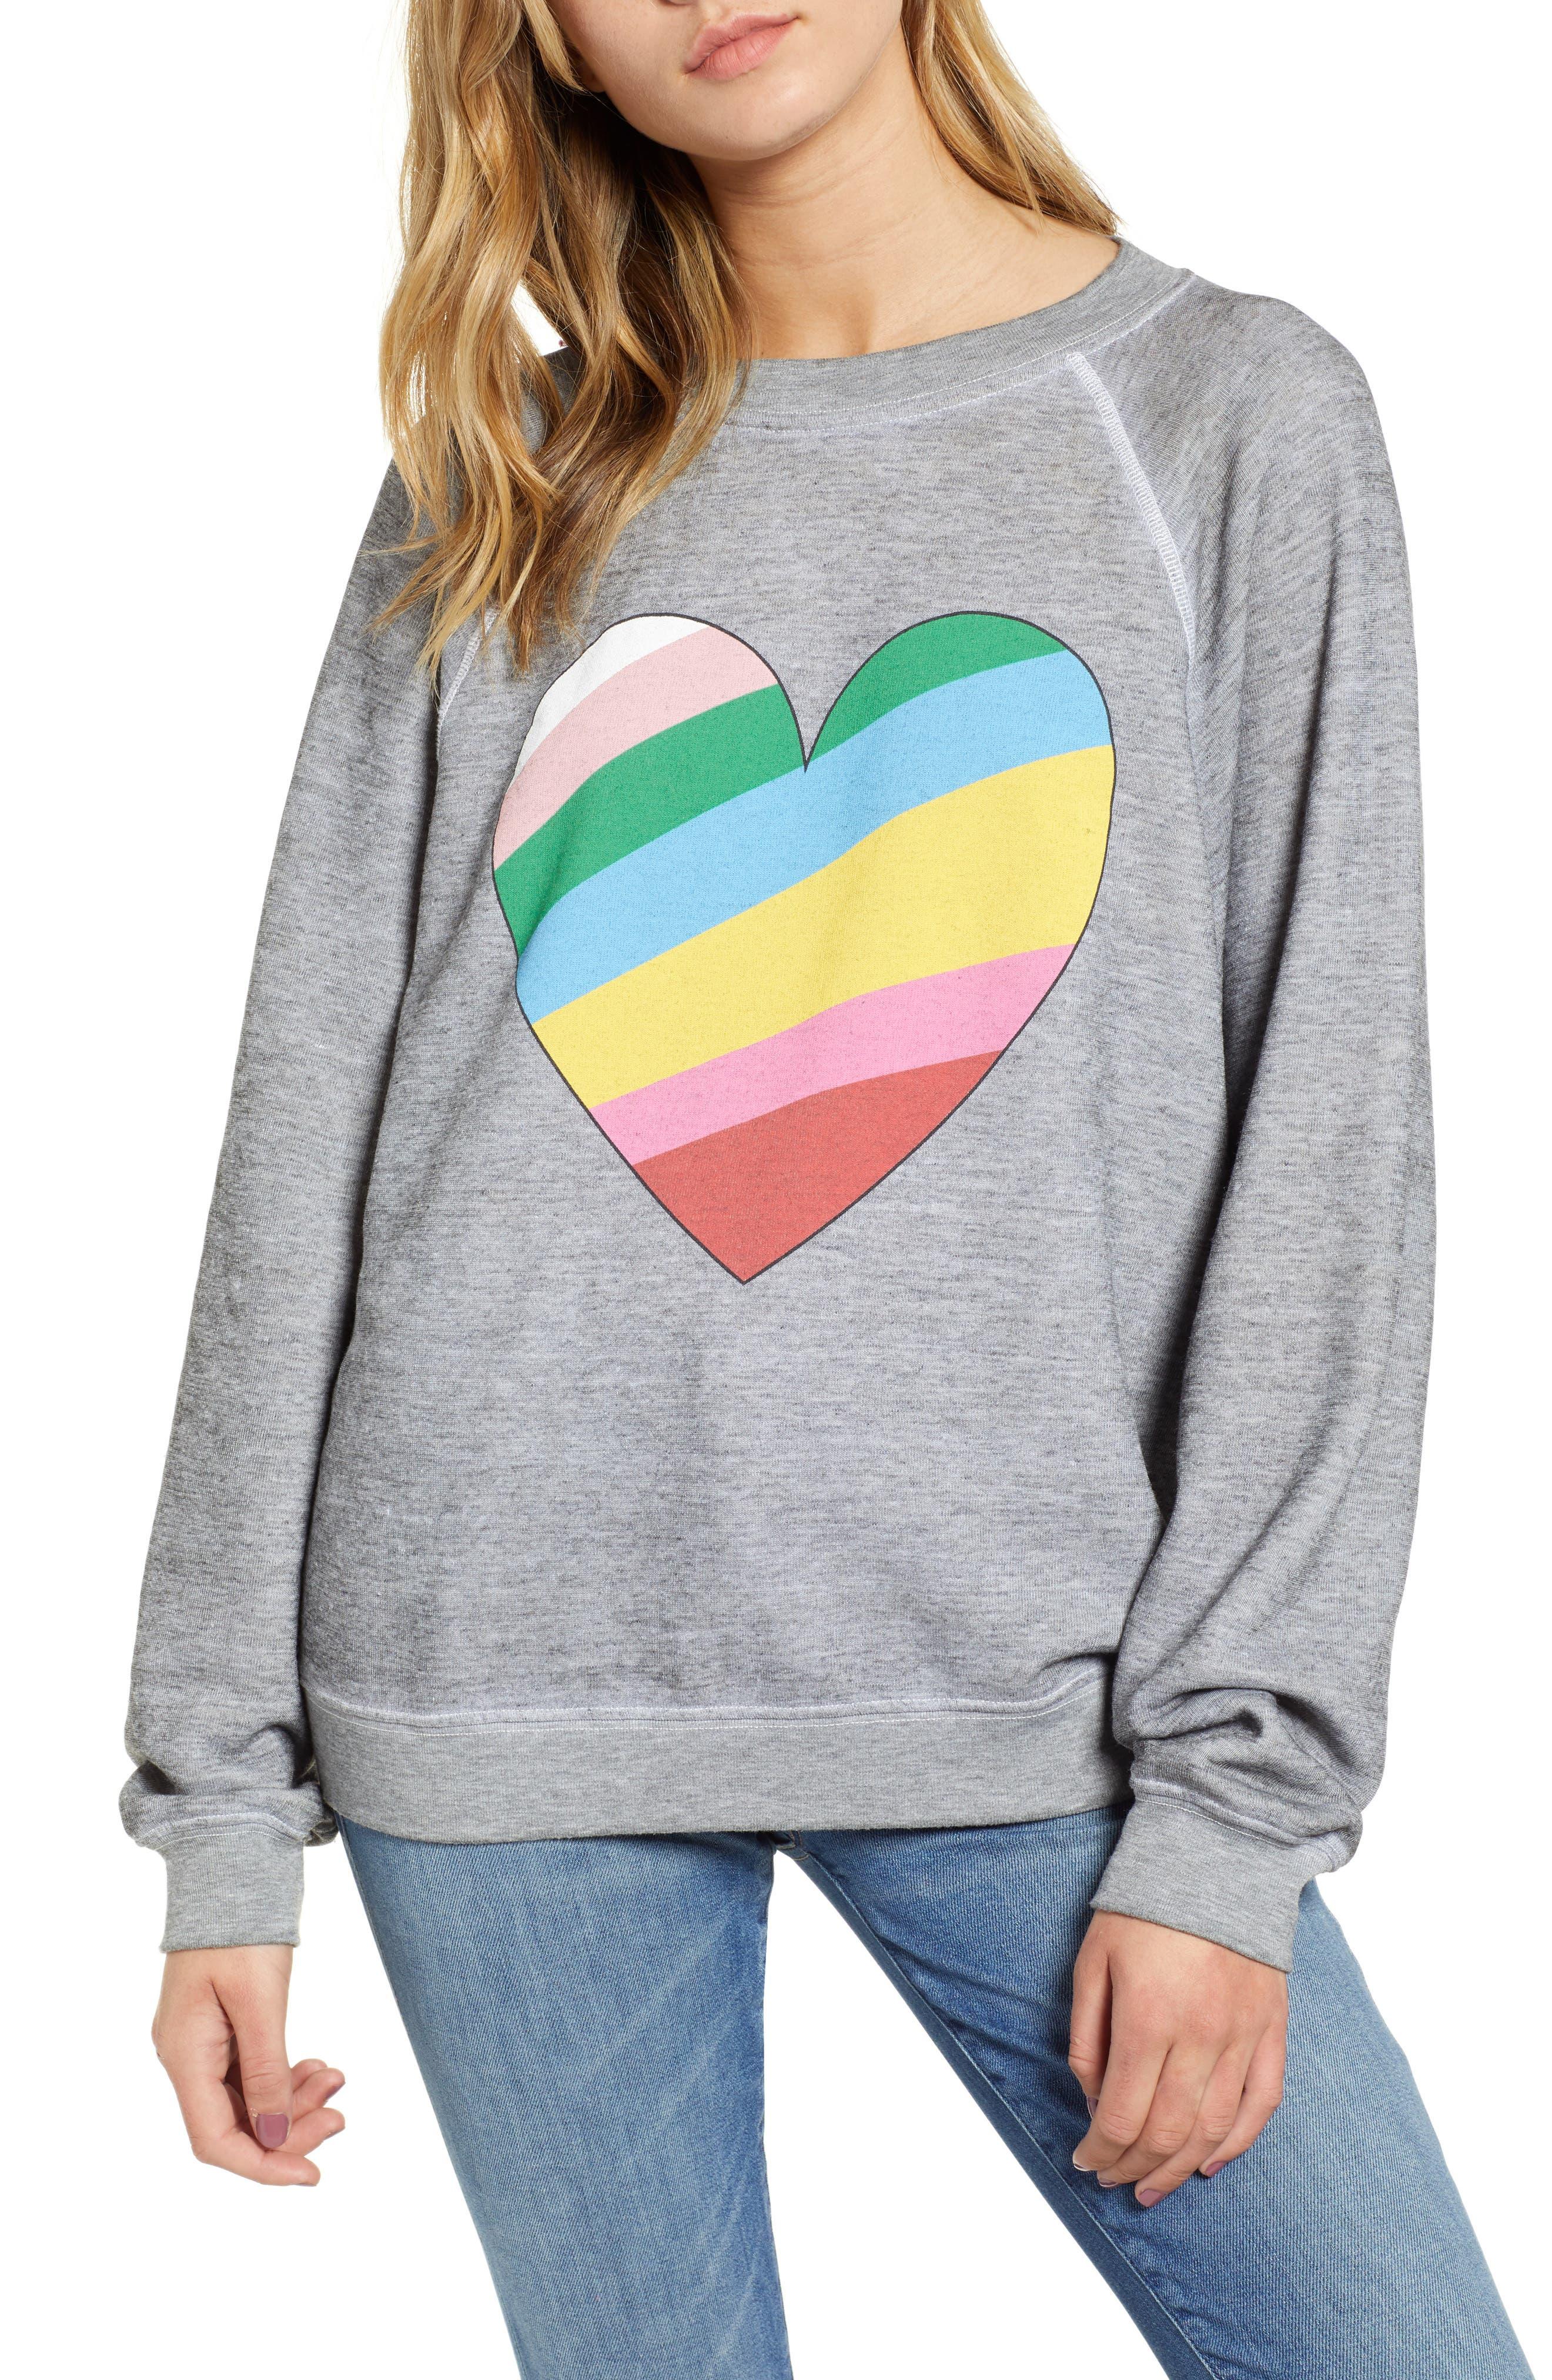 Sommers Love Hearts Sweatshirt,                             Main thumbnail 1, color,                             020